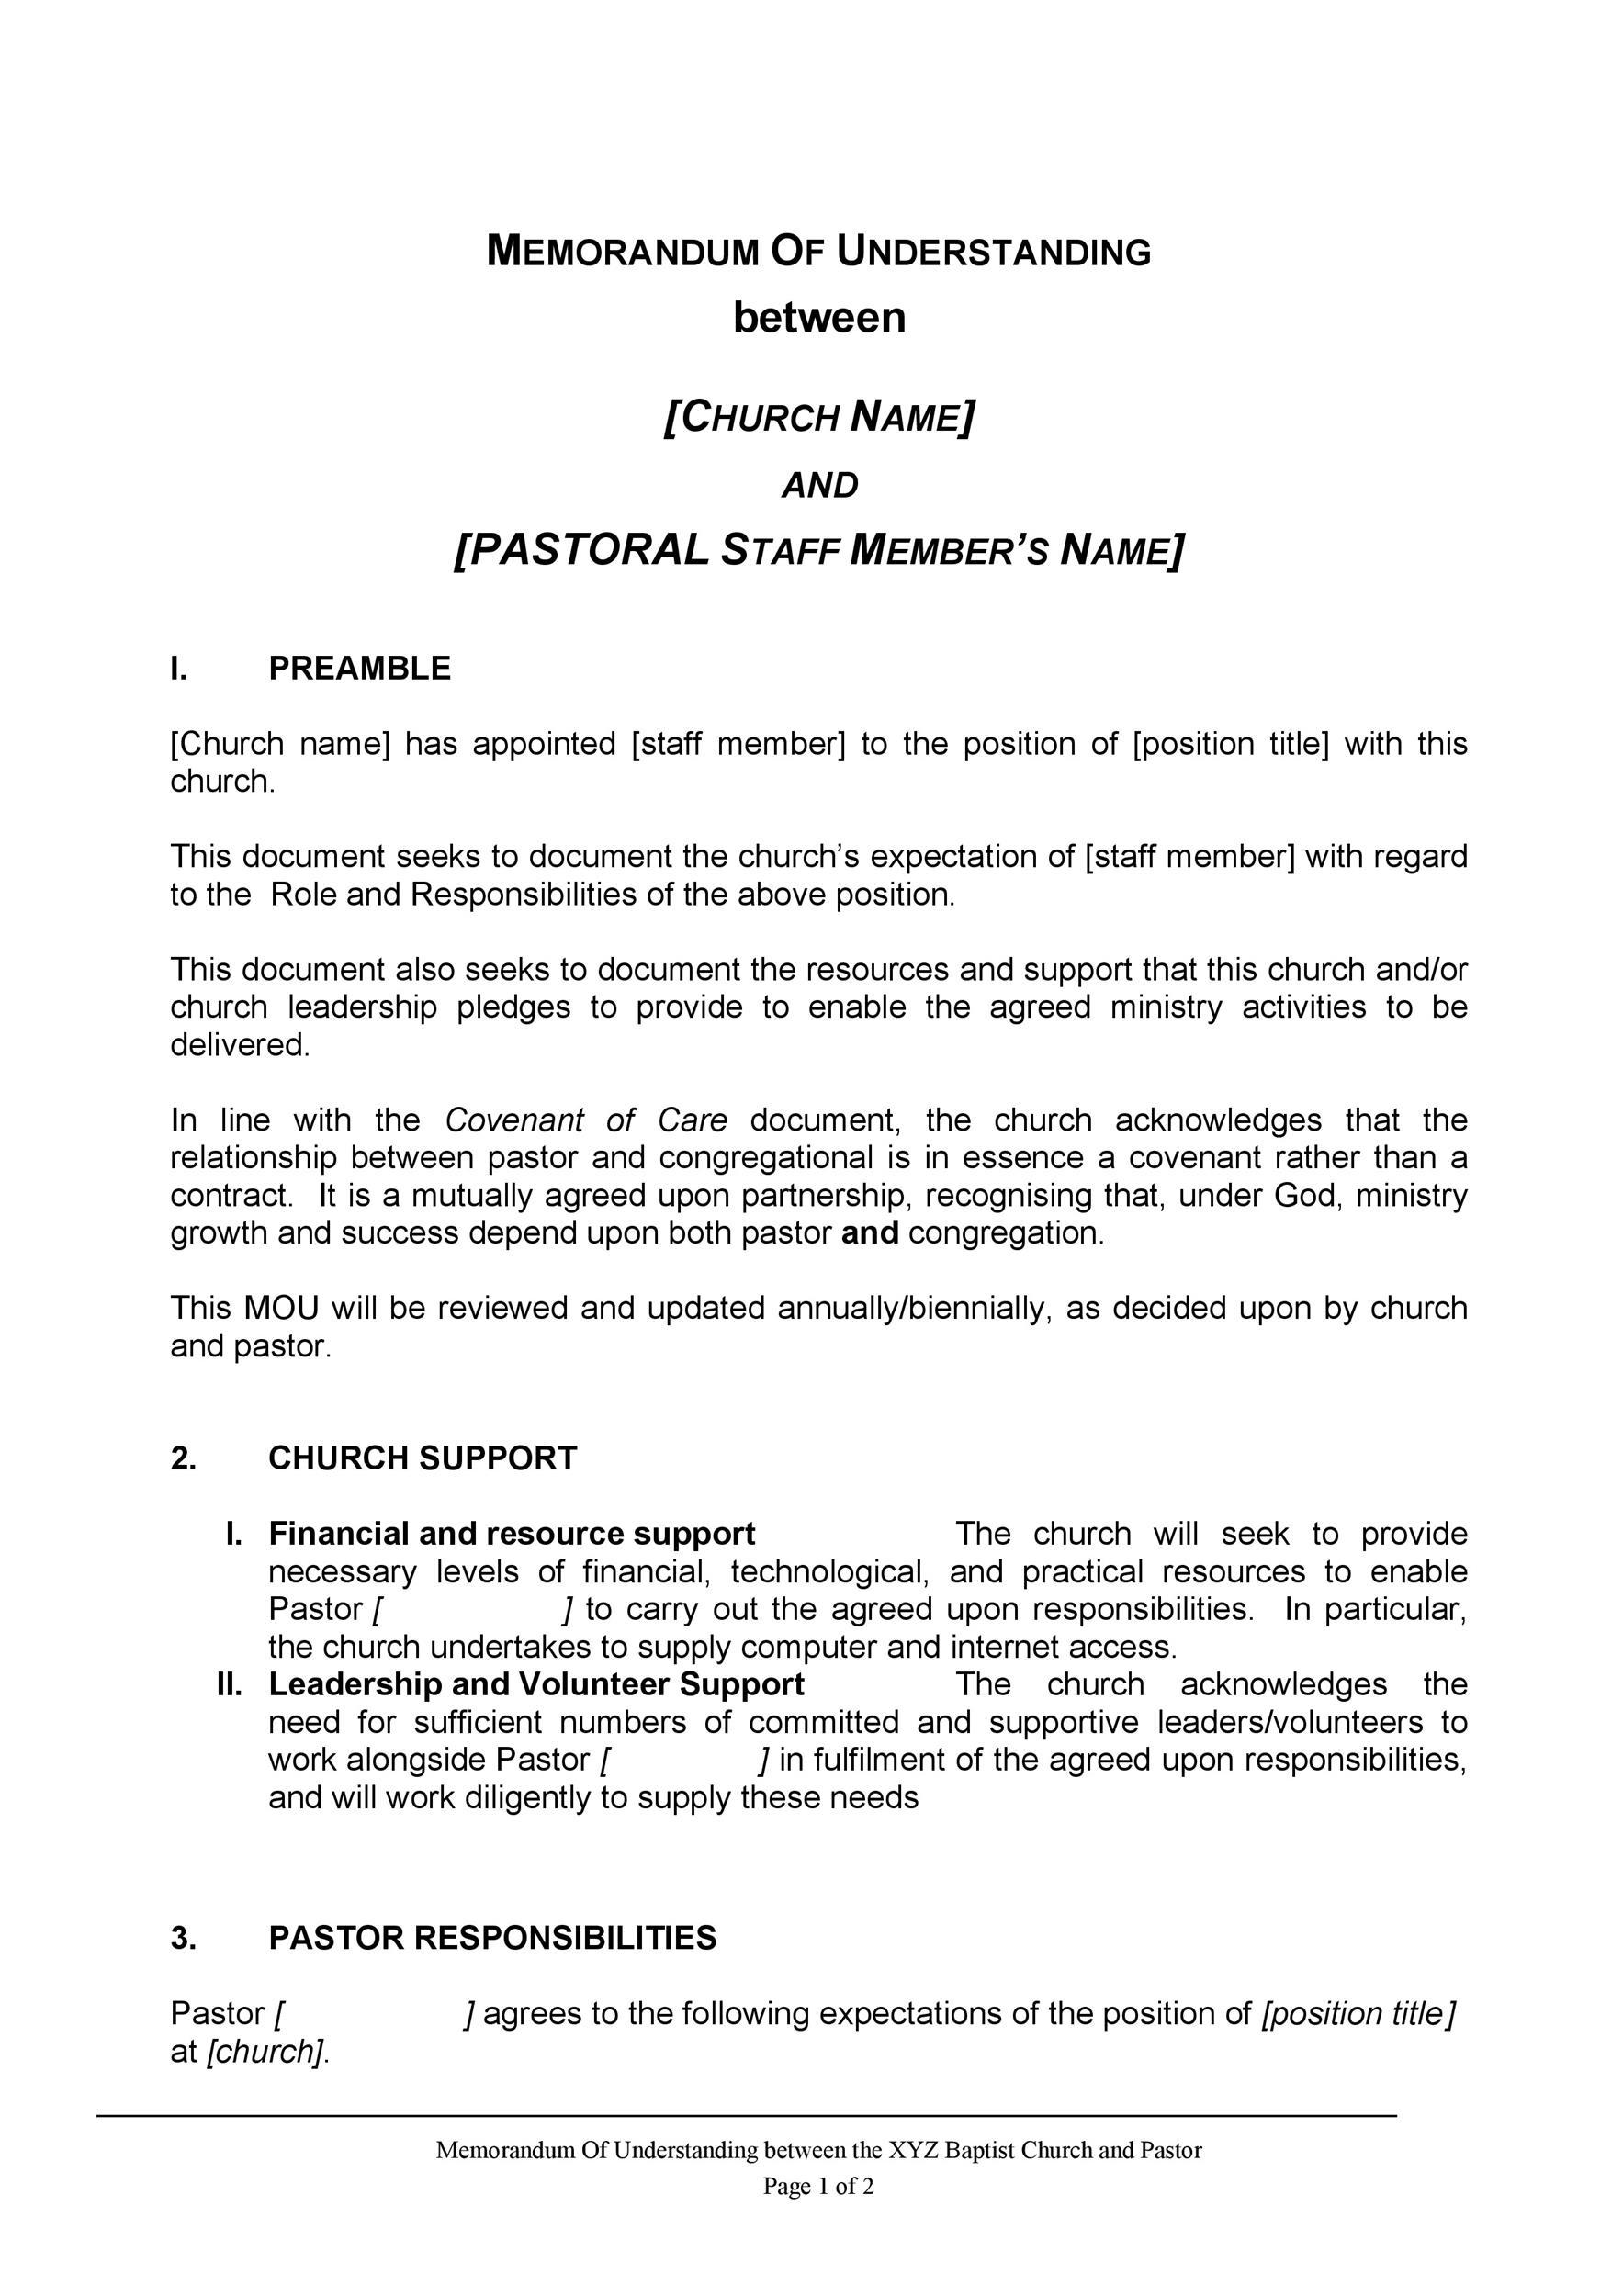 Free Memorandum of Understanding Template 19